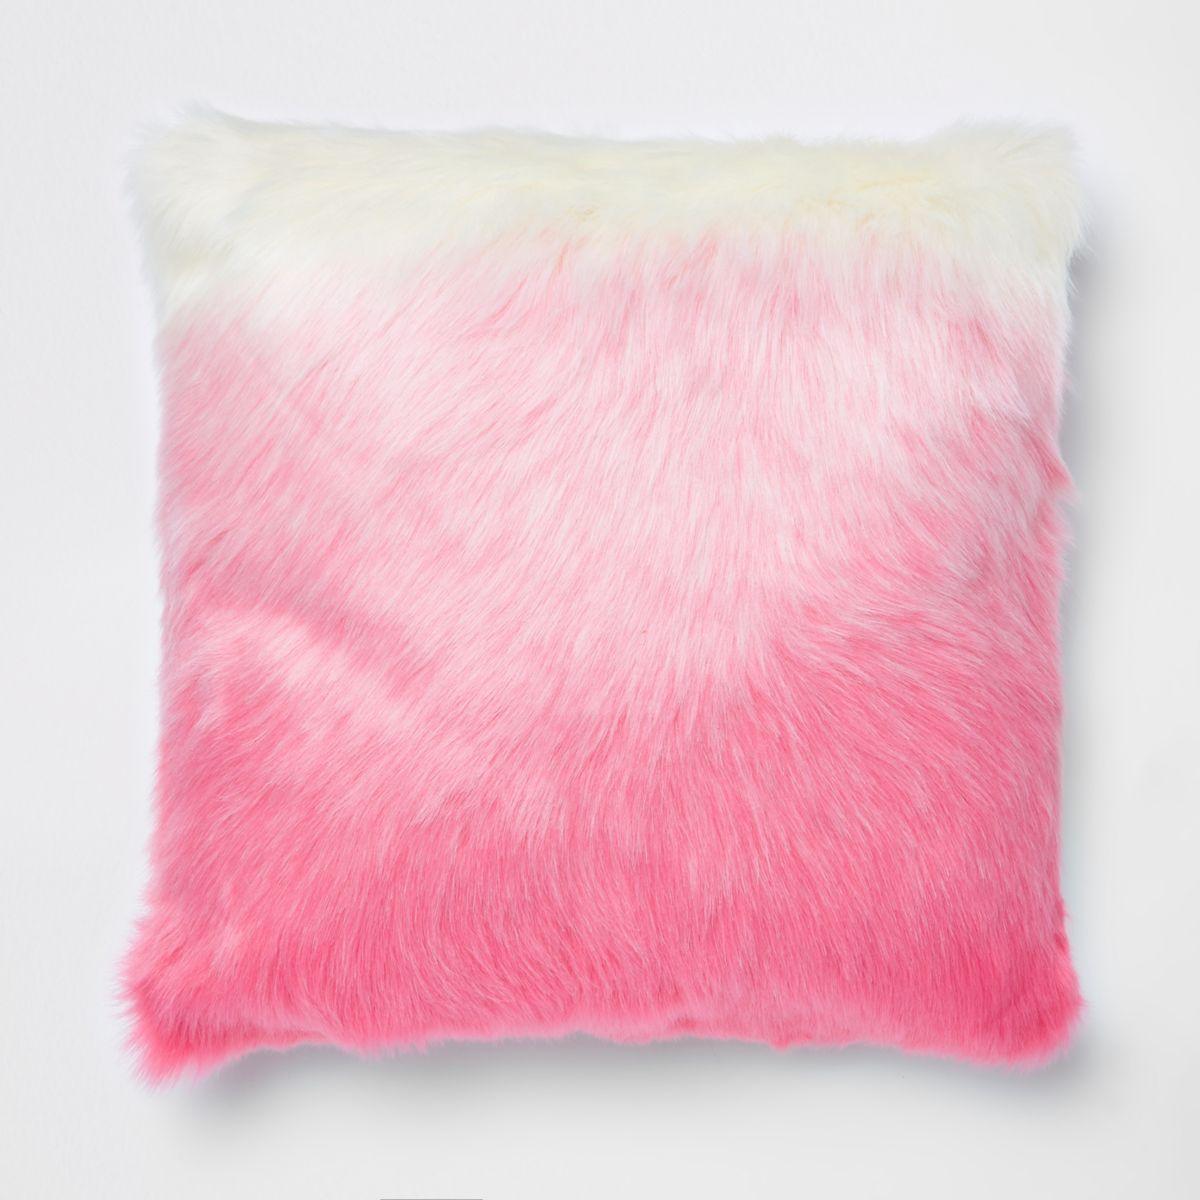 Pink Ombre Faux Fur Cushion, £45